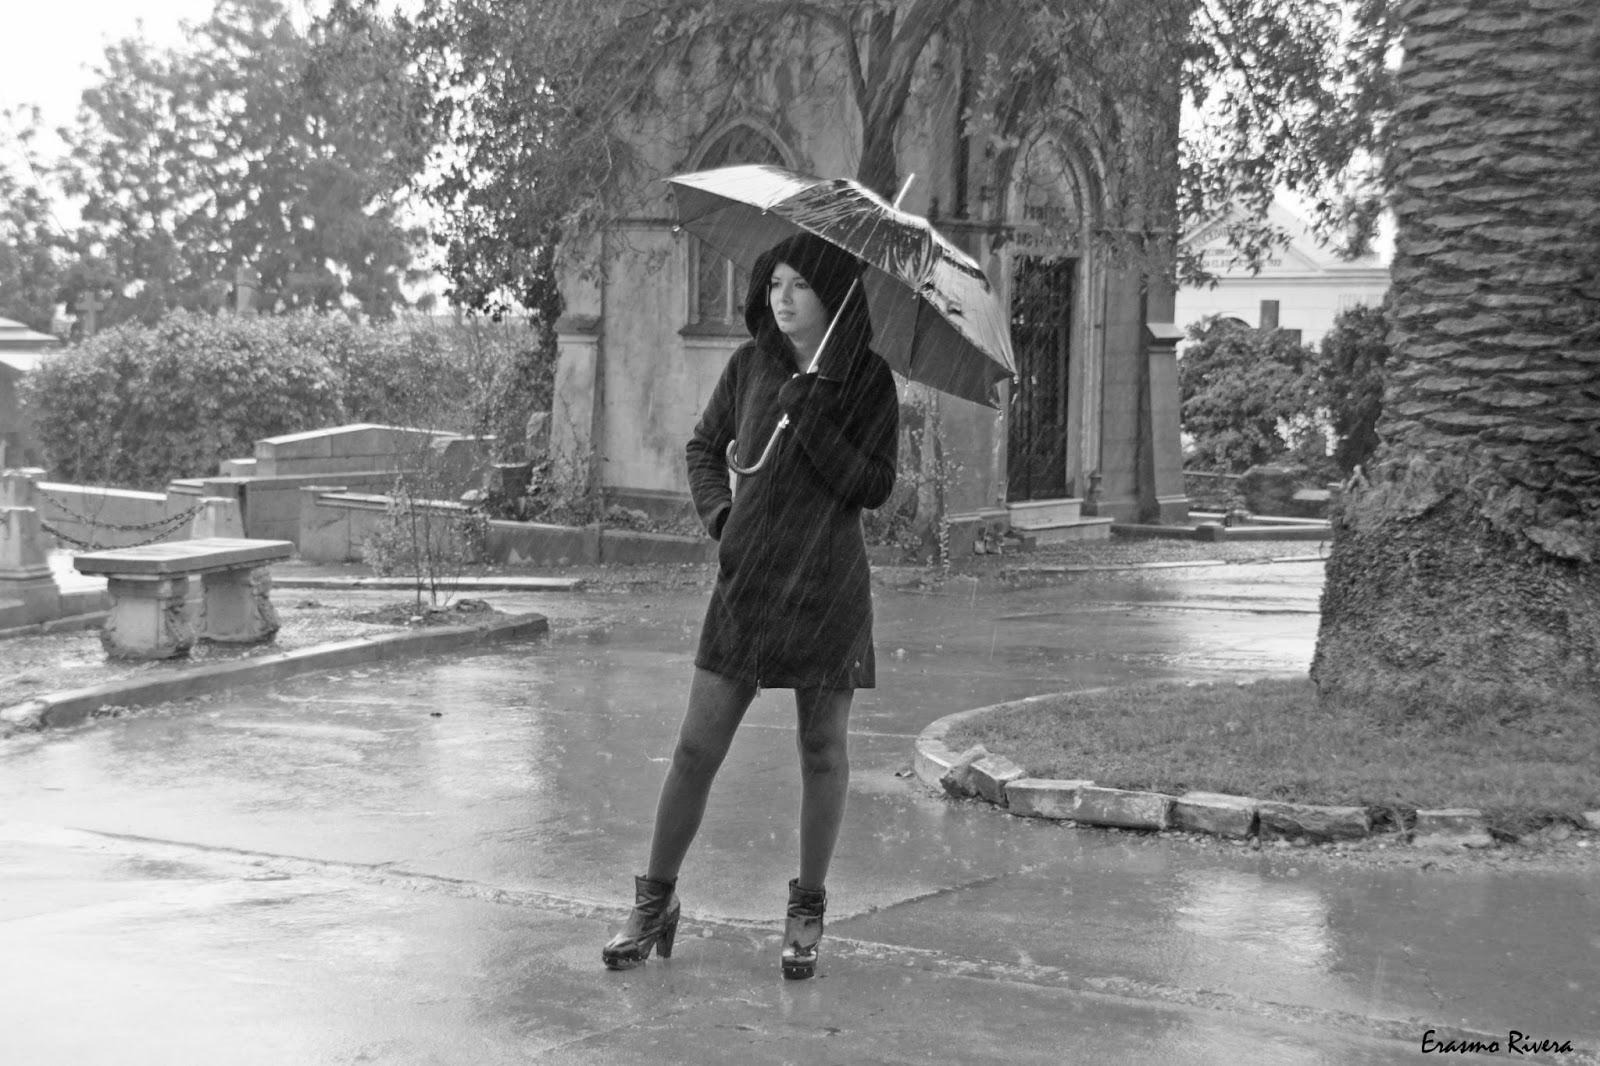 Bajo la lluvia - Página 15 Mujer%2Bbajo%2Blluvia%2Bpoema%2Bde%2Bla%2Blluvia%2Bpoemas%2Bal%2Balma%2Bversos%2Bal%2Balma%2Binvierno%2Bpoemas%2Bde%2Binvierno